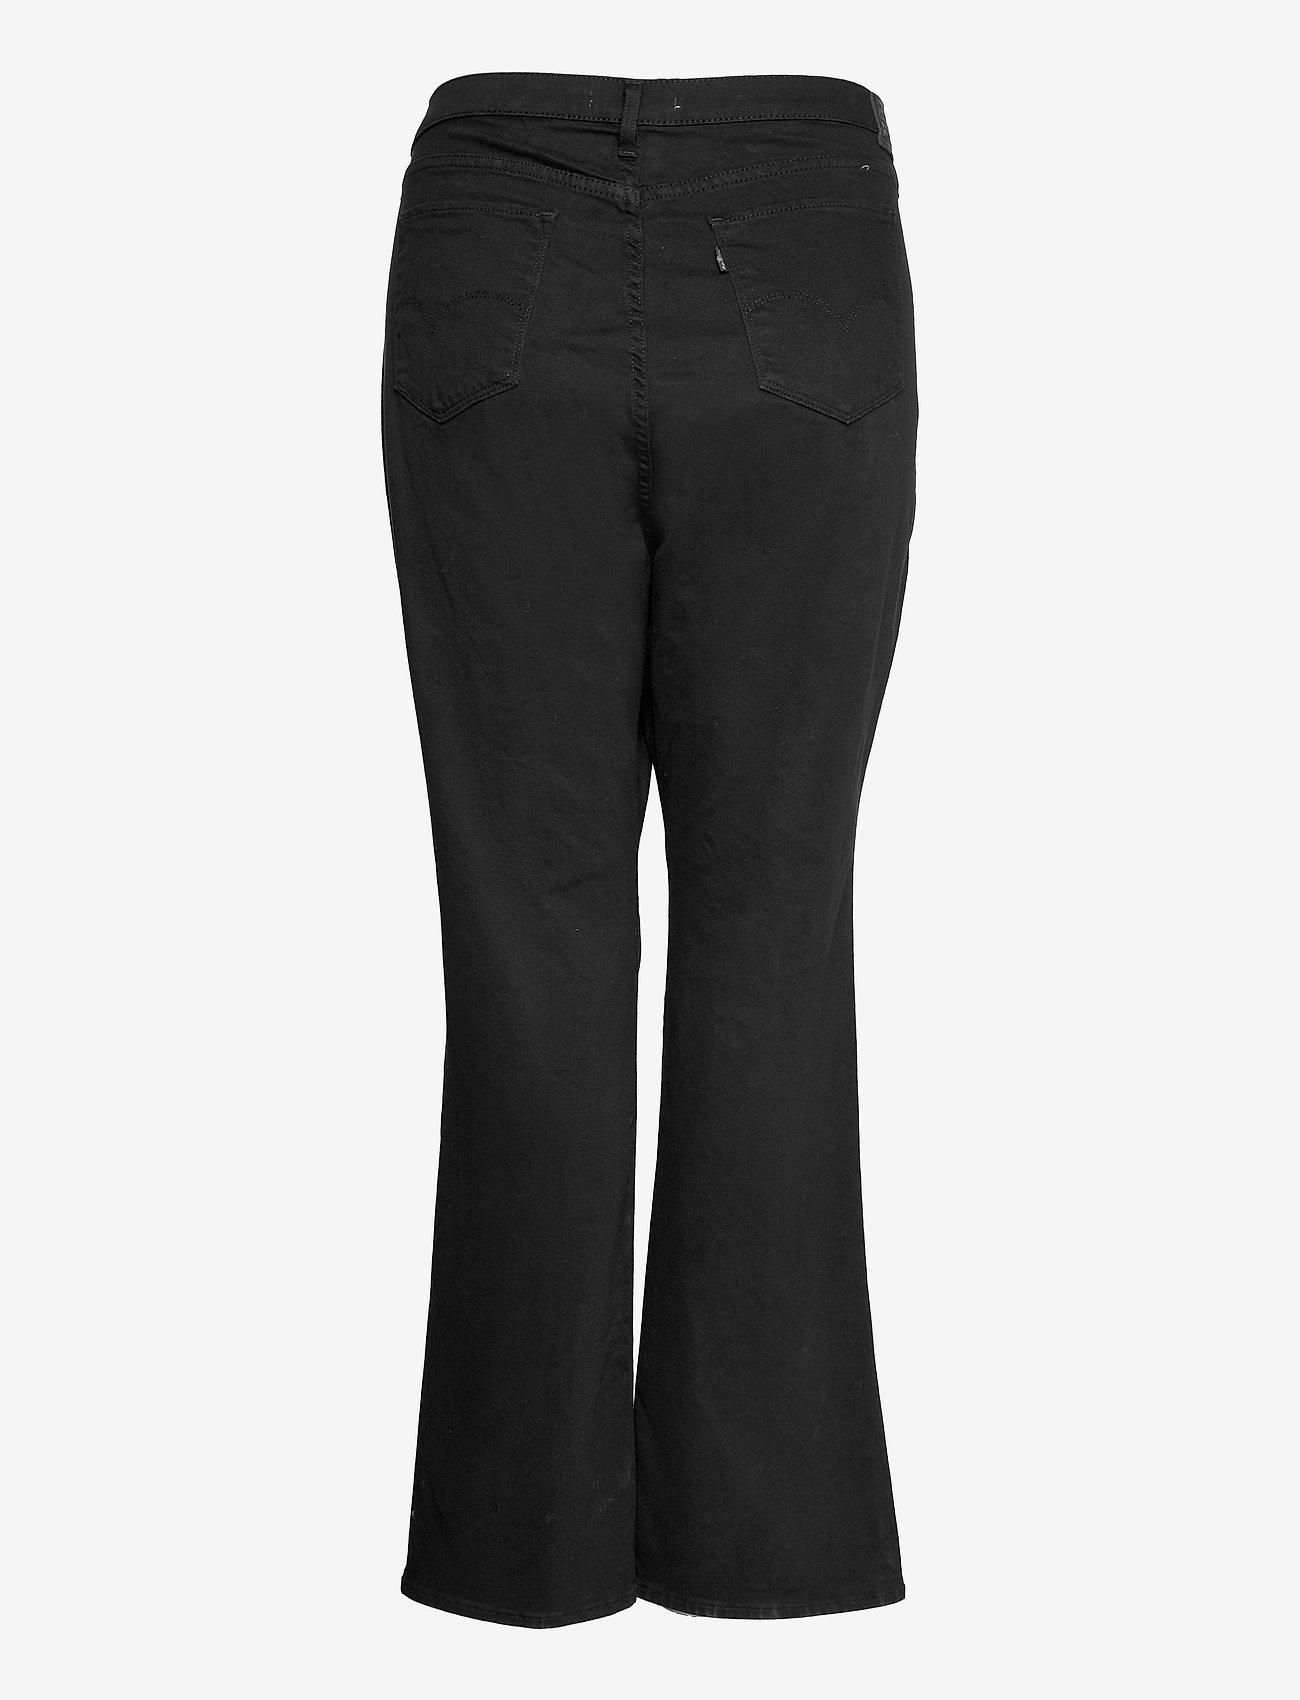 Levi's Plus Size - 725 PL HR BOOTCUT NIGHT IS BLA - bootcut jeans - blacks - 1